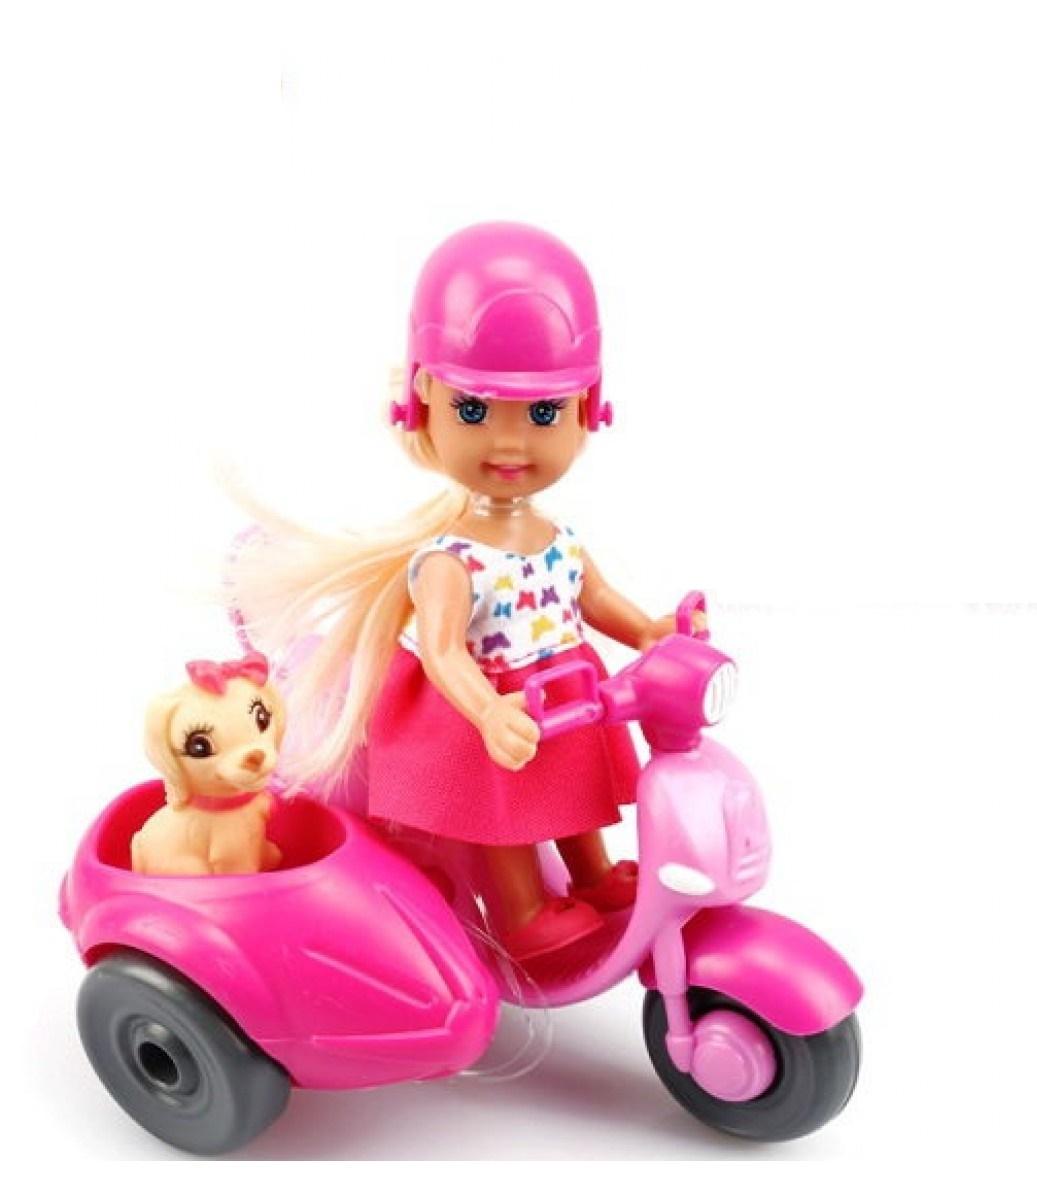 Мини-кукла No Name K080181 с мотоциклом собачкой аксессуарами, 1124649 розовый